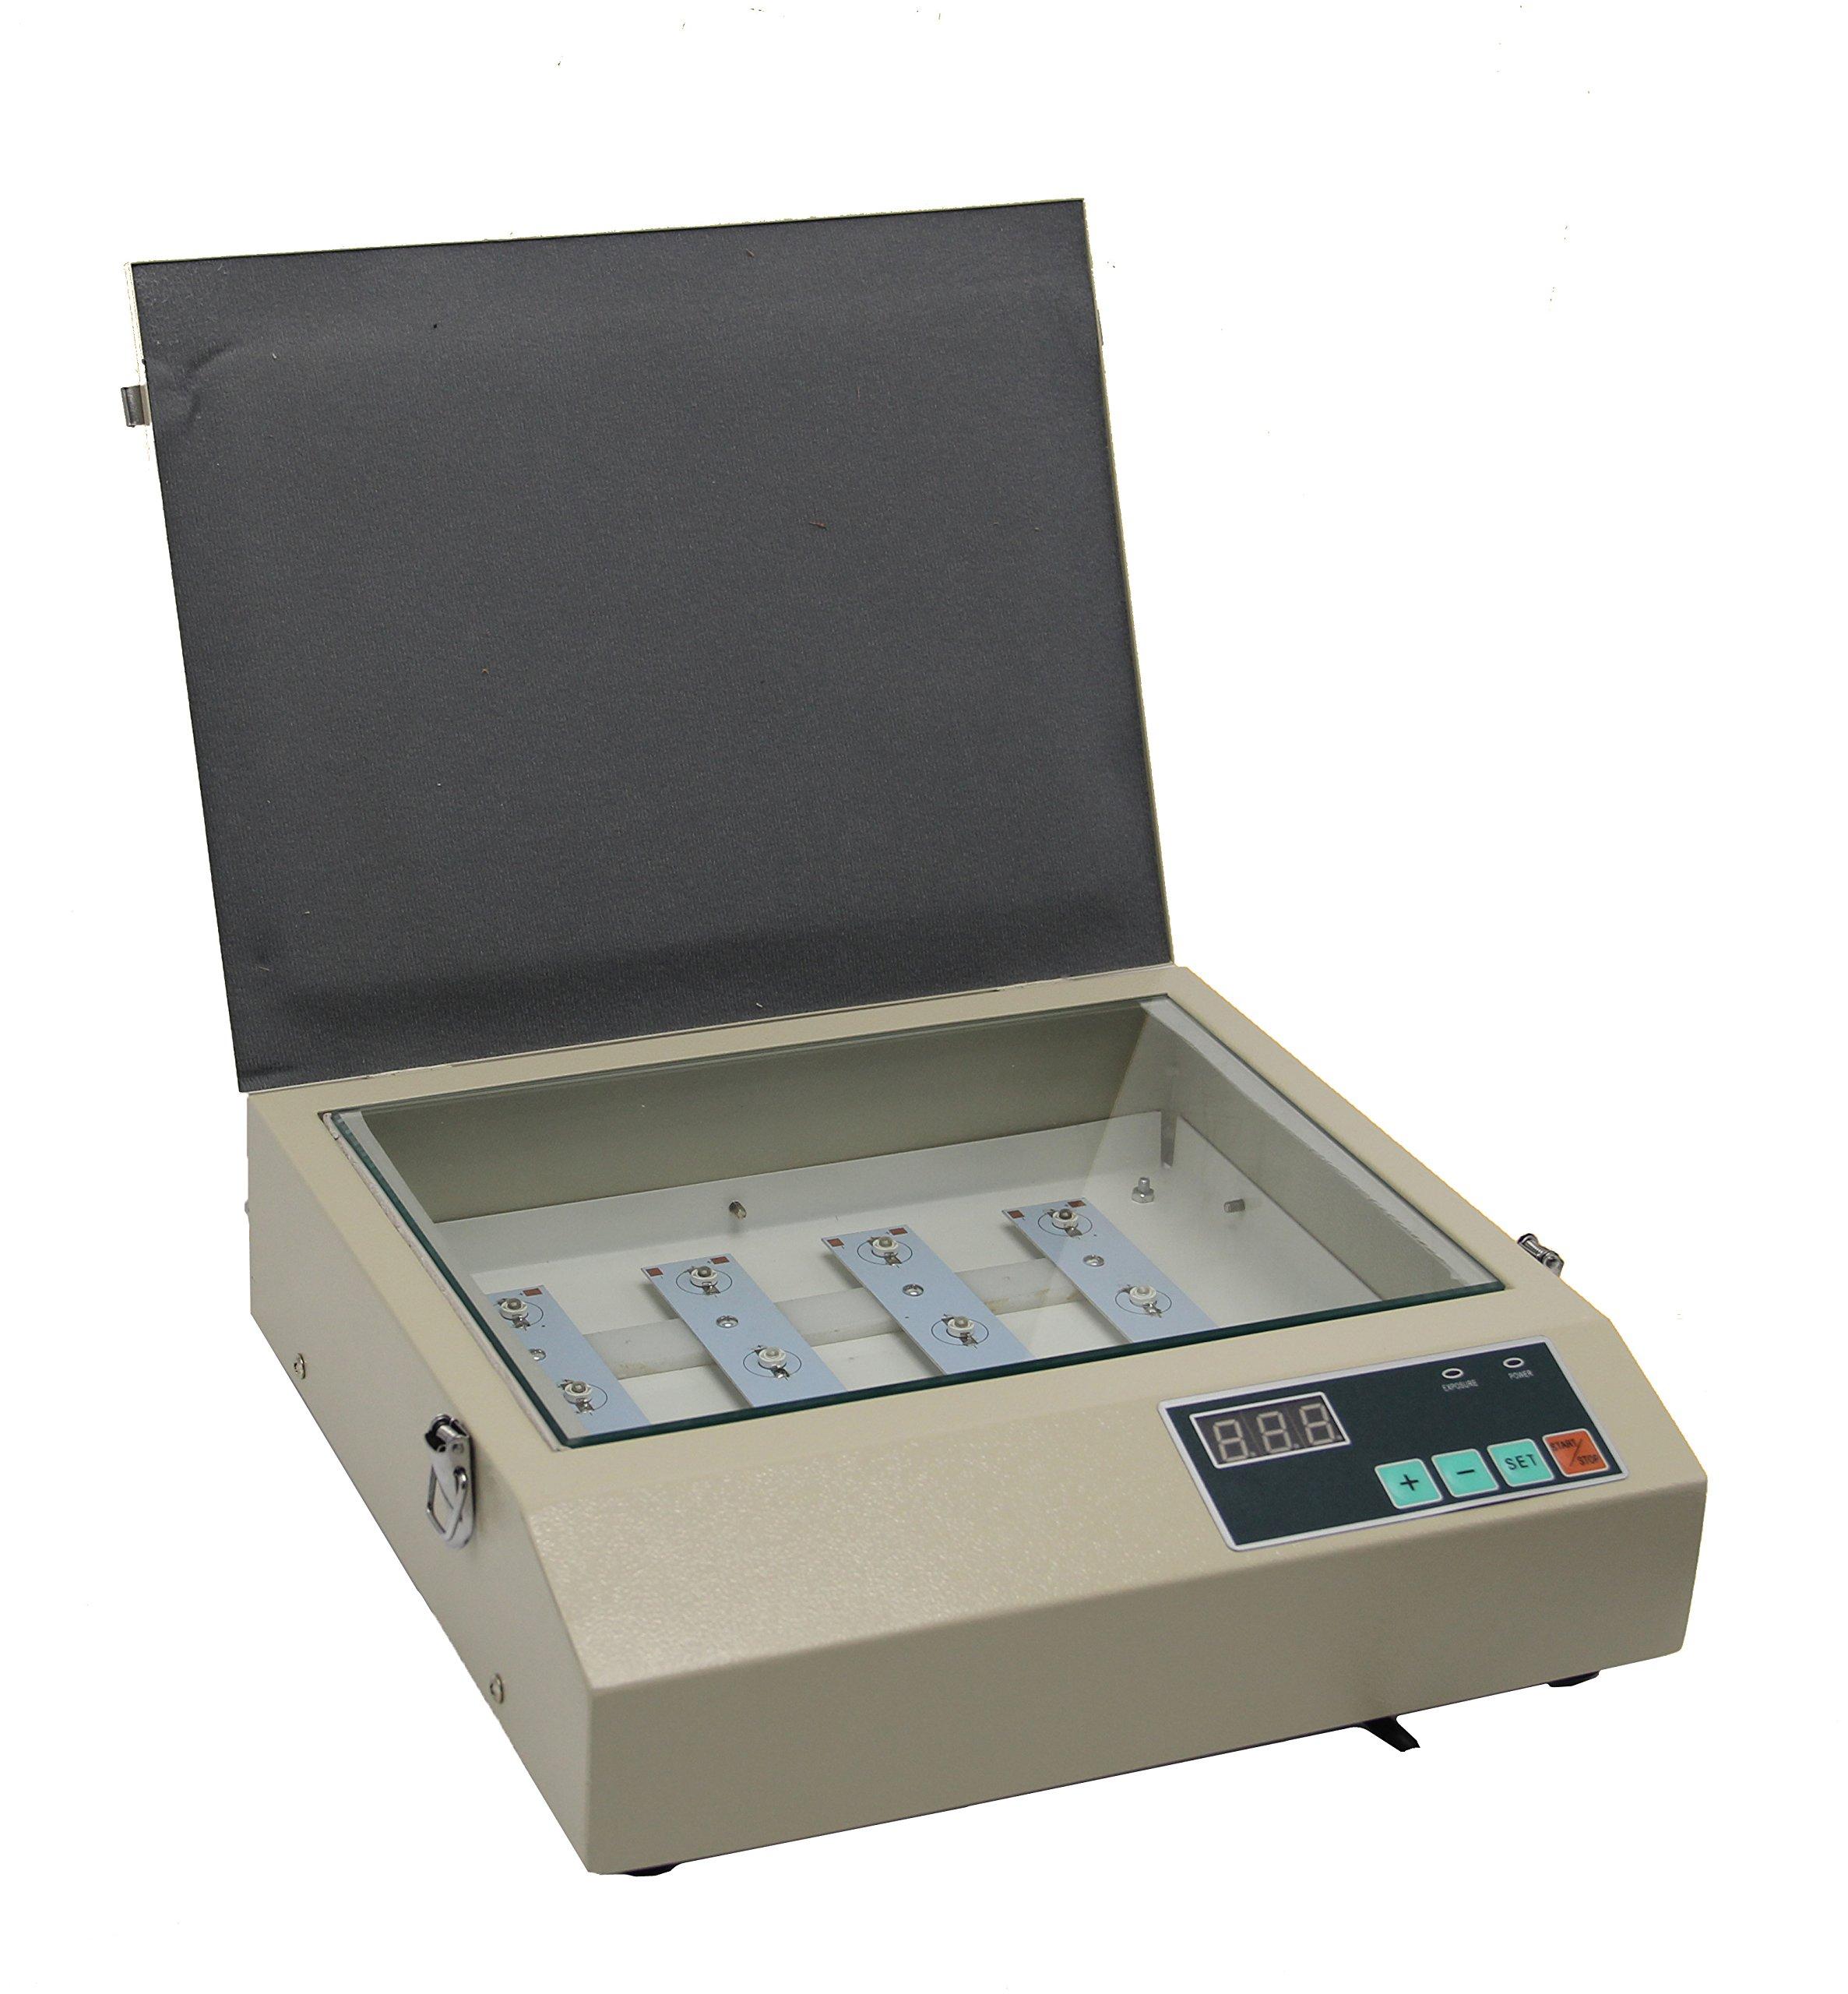 Huanyu SC-280 UV Exposure Unit Hot Foil Stamping Screen Pad Printing Machine PCB/ Resin Version Printing-Down Machine PS Edition Print Machine by Huanyu